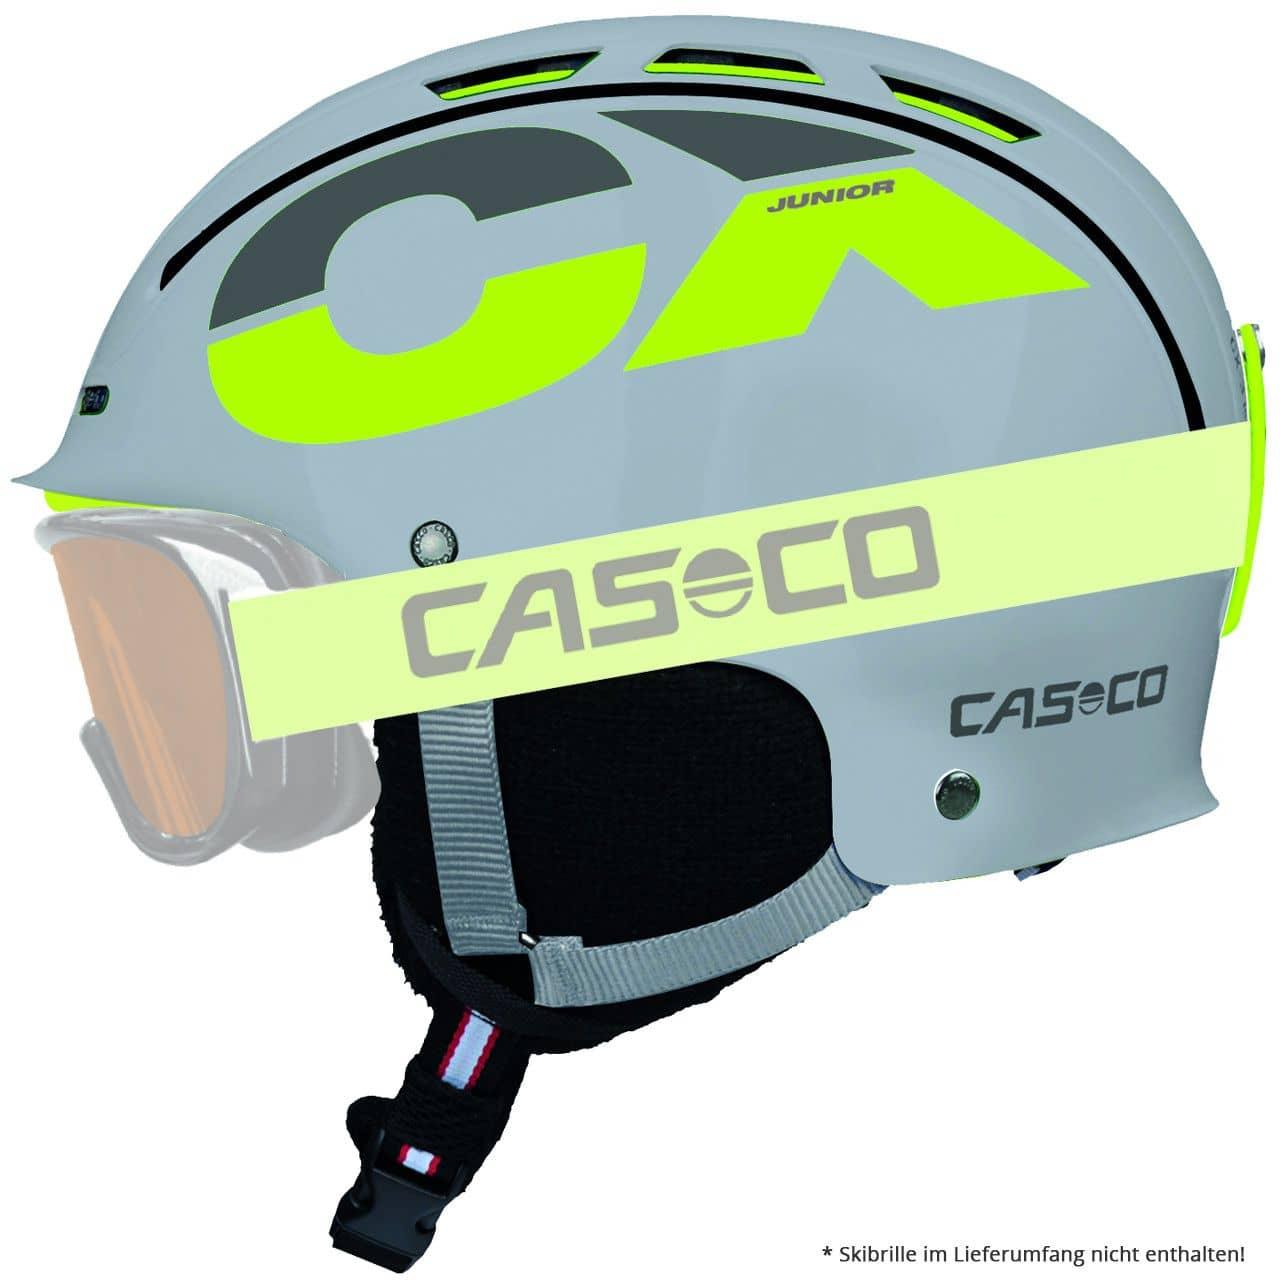 Casco CX-3 Junior grau-neon (2018/19) - S = 50 ...